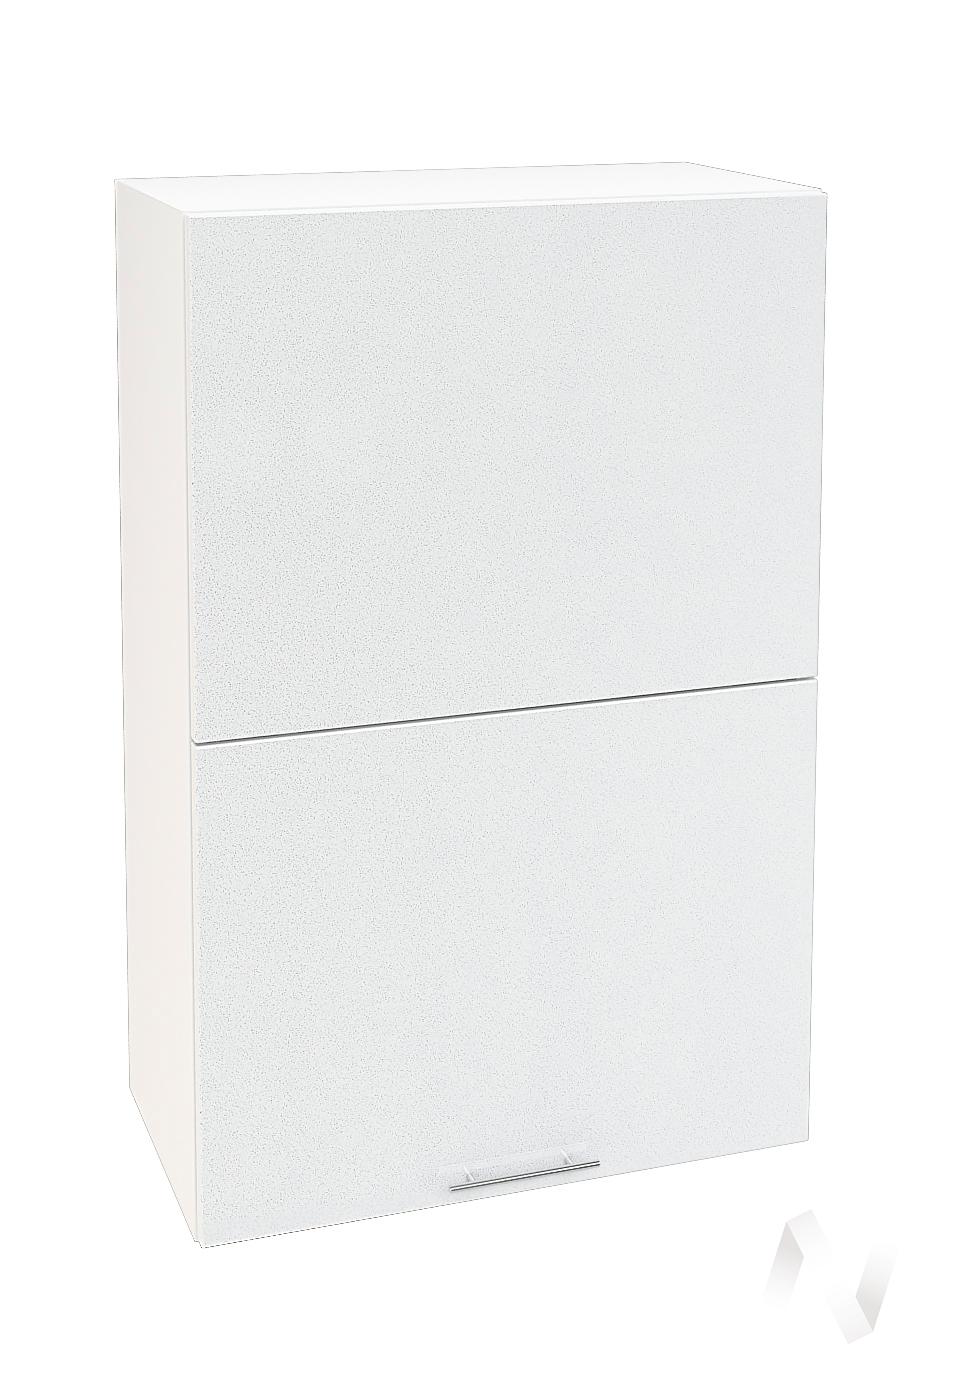 "Кухня ""Валерия-М"": Шкаф верхний горизонтальный 602, ШВГ 602 (белый металлик/корпус белый)"